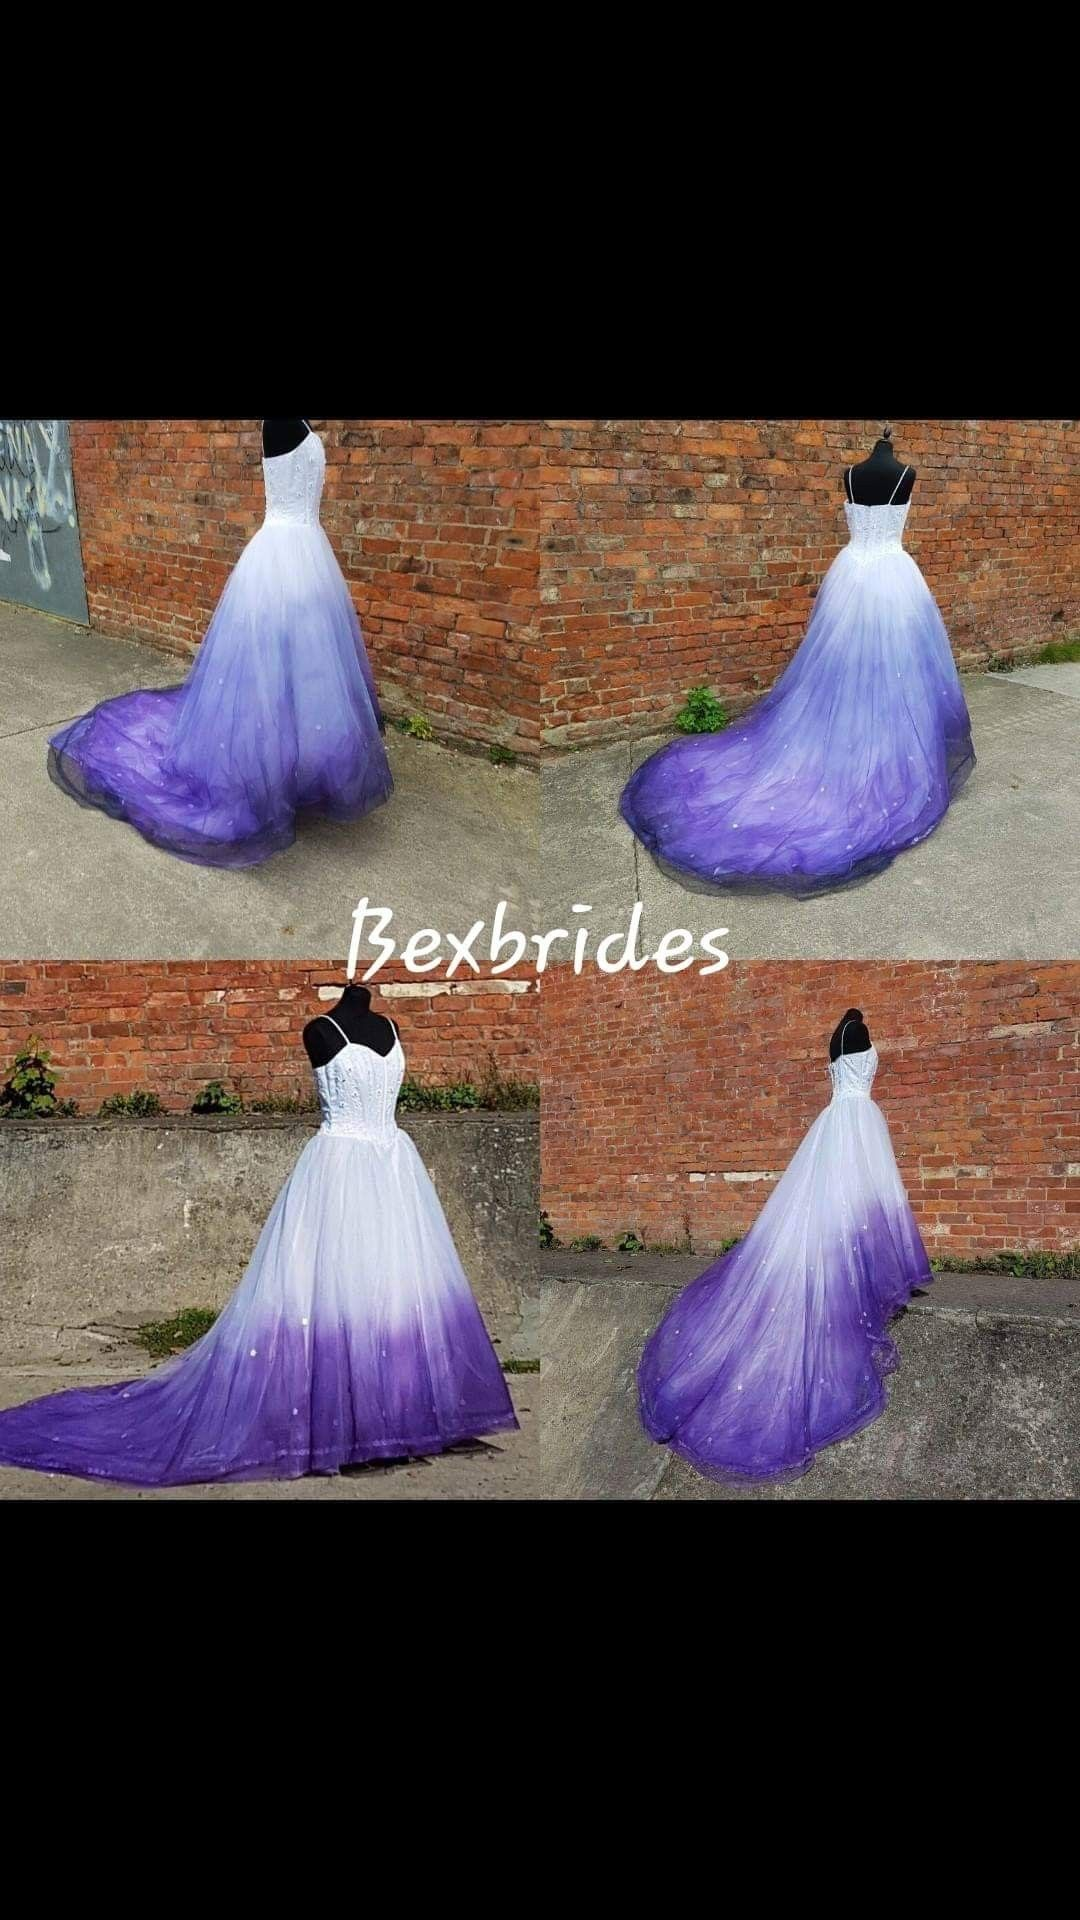 Hand Ombre Vintage Gown By Bexbrides Dip Dye Effect Wedding Dress Purple Wedding Gown Dip Dye Wedding Dress Dipped Wedding Dress [ 1920 x 1080 Pixel ]